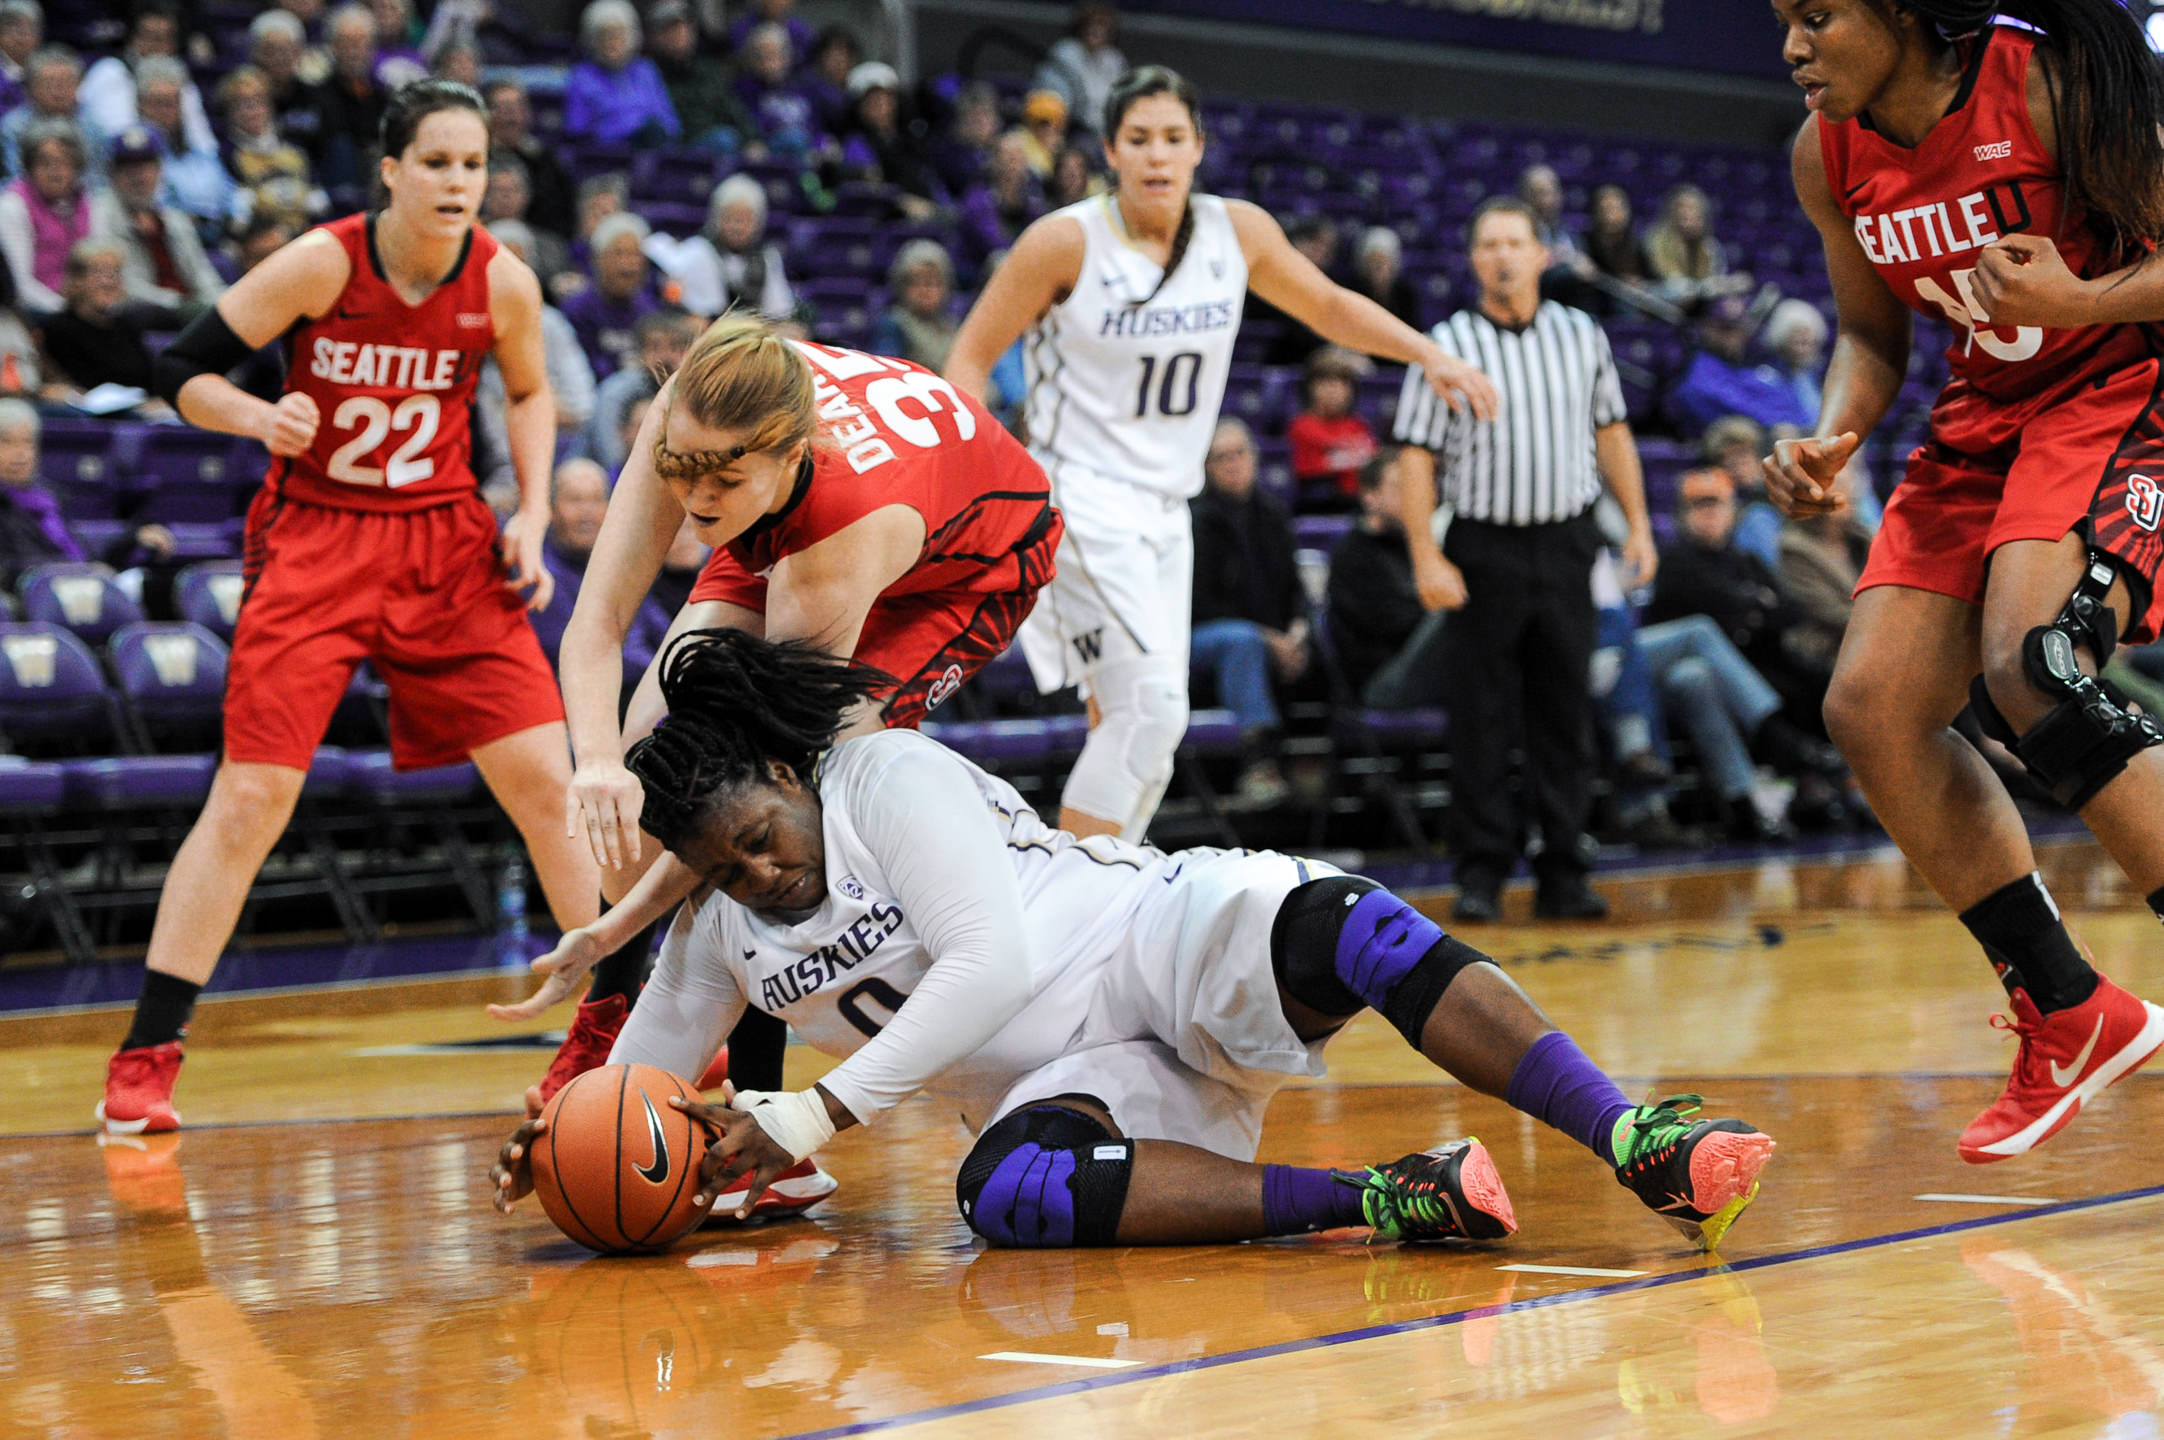 University of Washington Huskies Women's Basketball Chantel Osahor Dives for Ball against Seattle U Redhawks